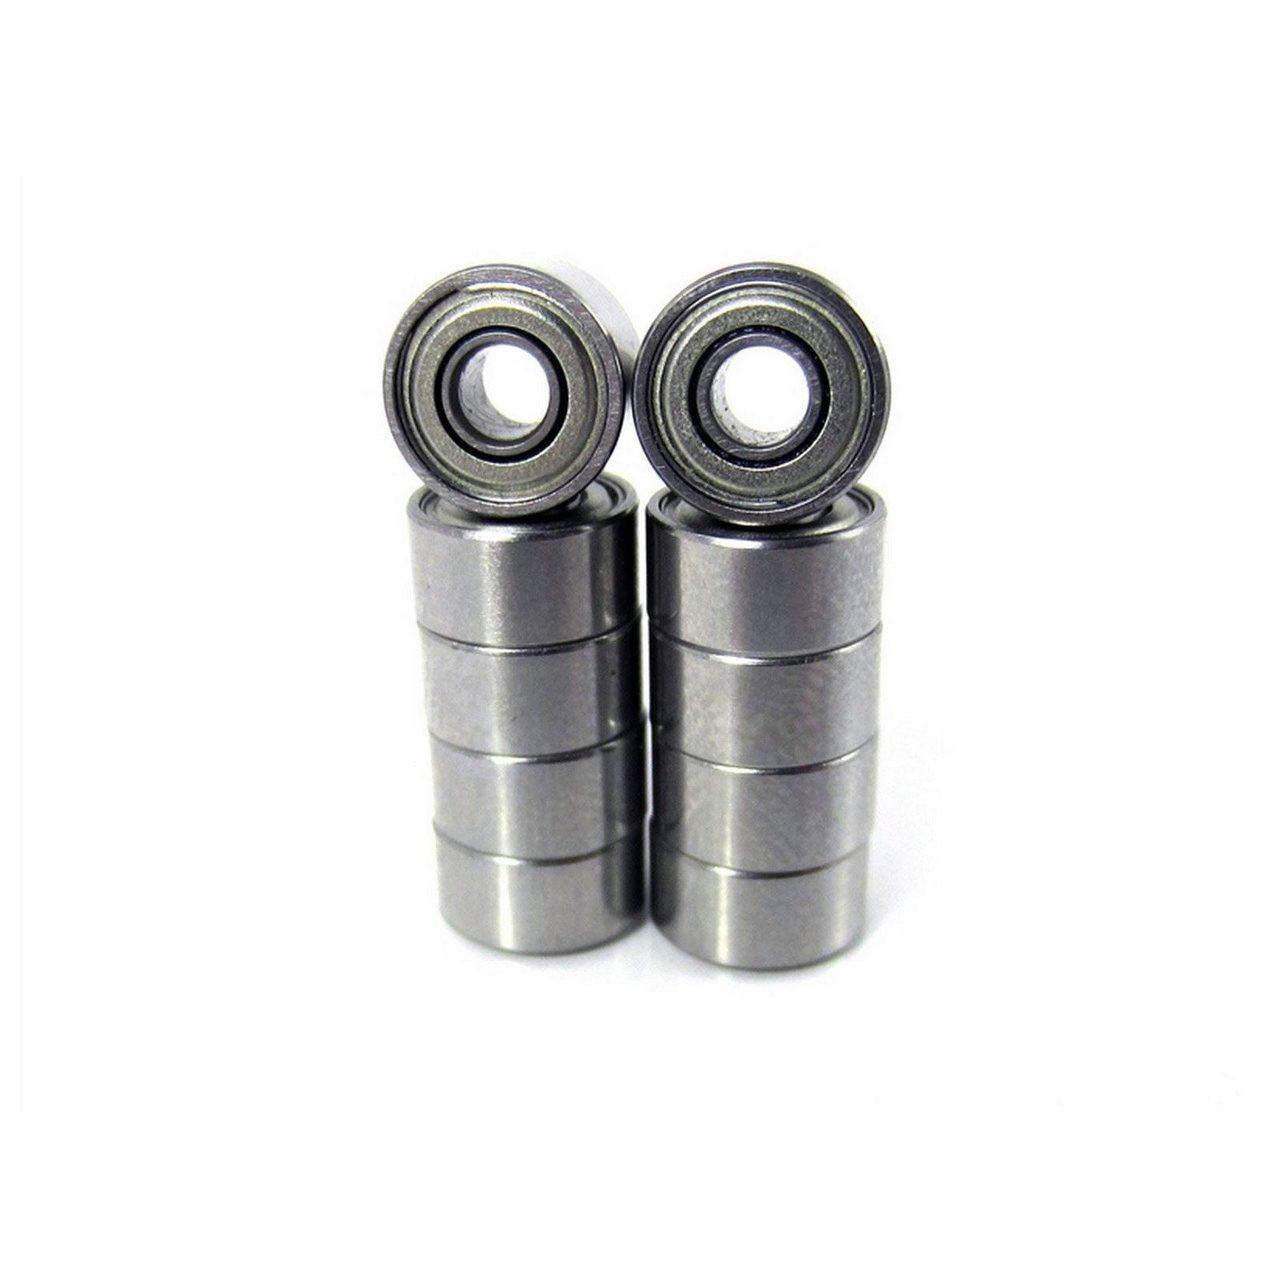 TRB RC 3x8x4mm Precision Ceramic Ball Bearings Metal Shields (10)